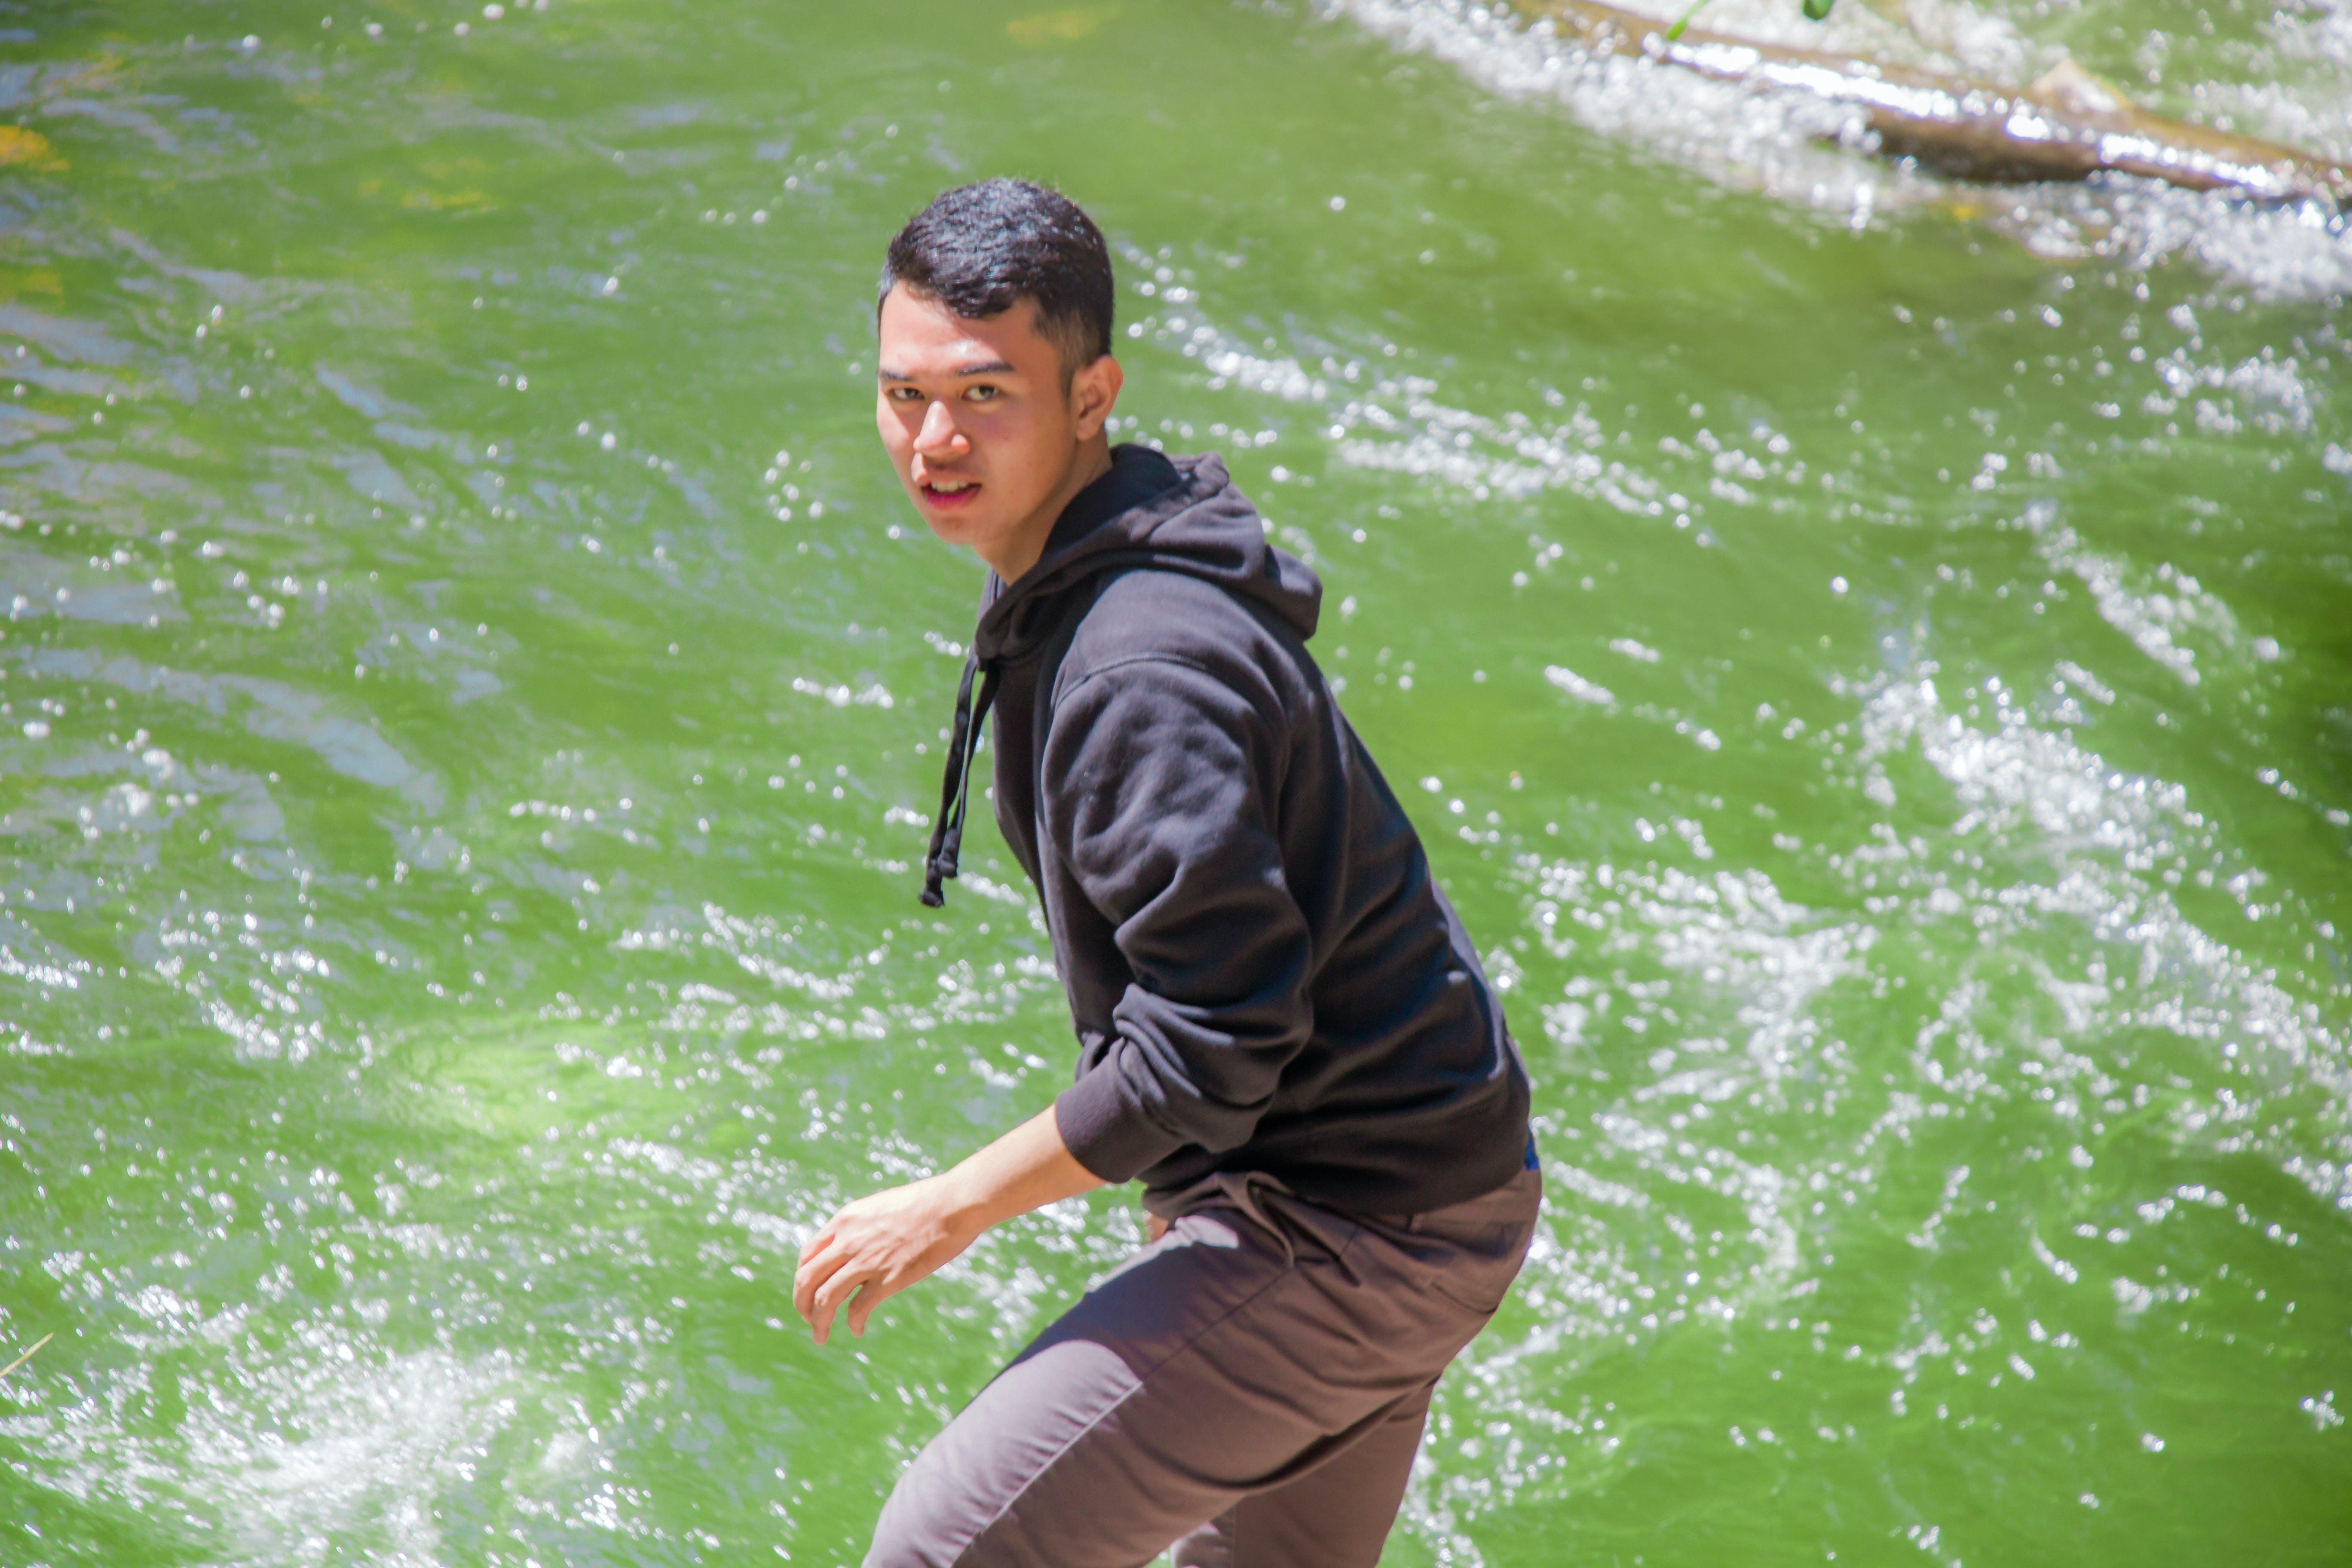 Man in Black Hoodie Standing in Front of Body of Water